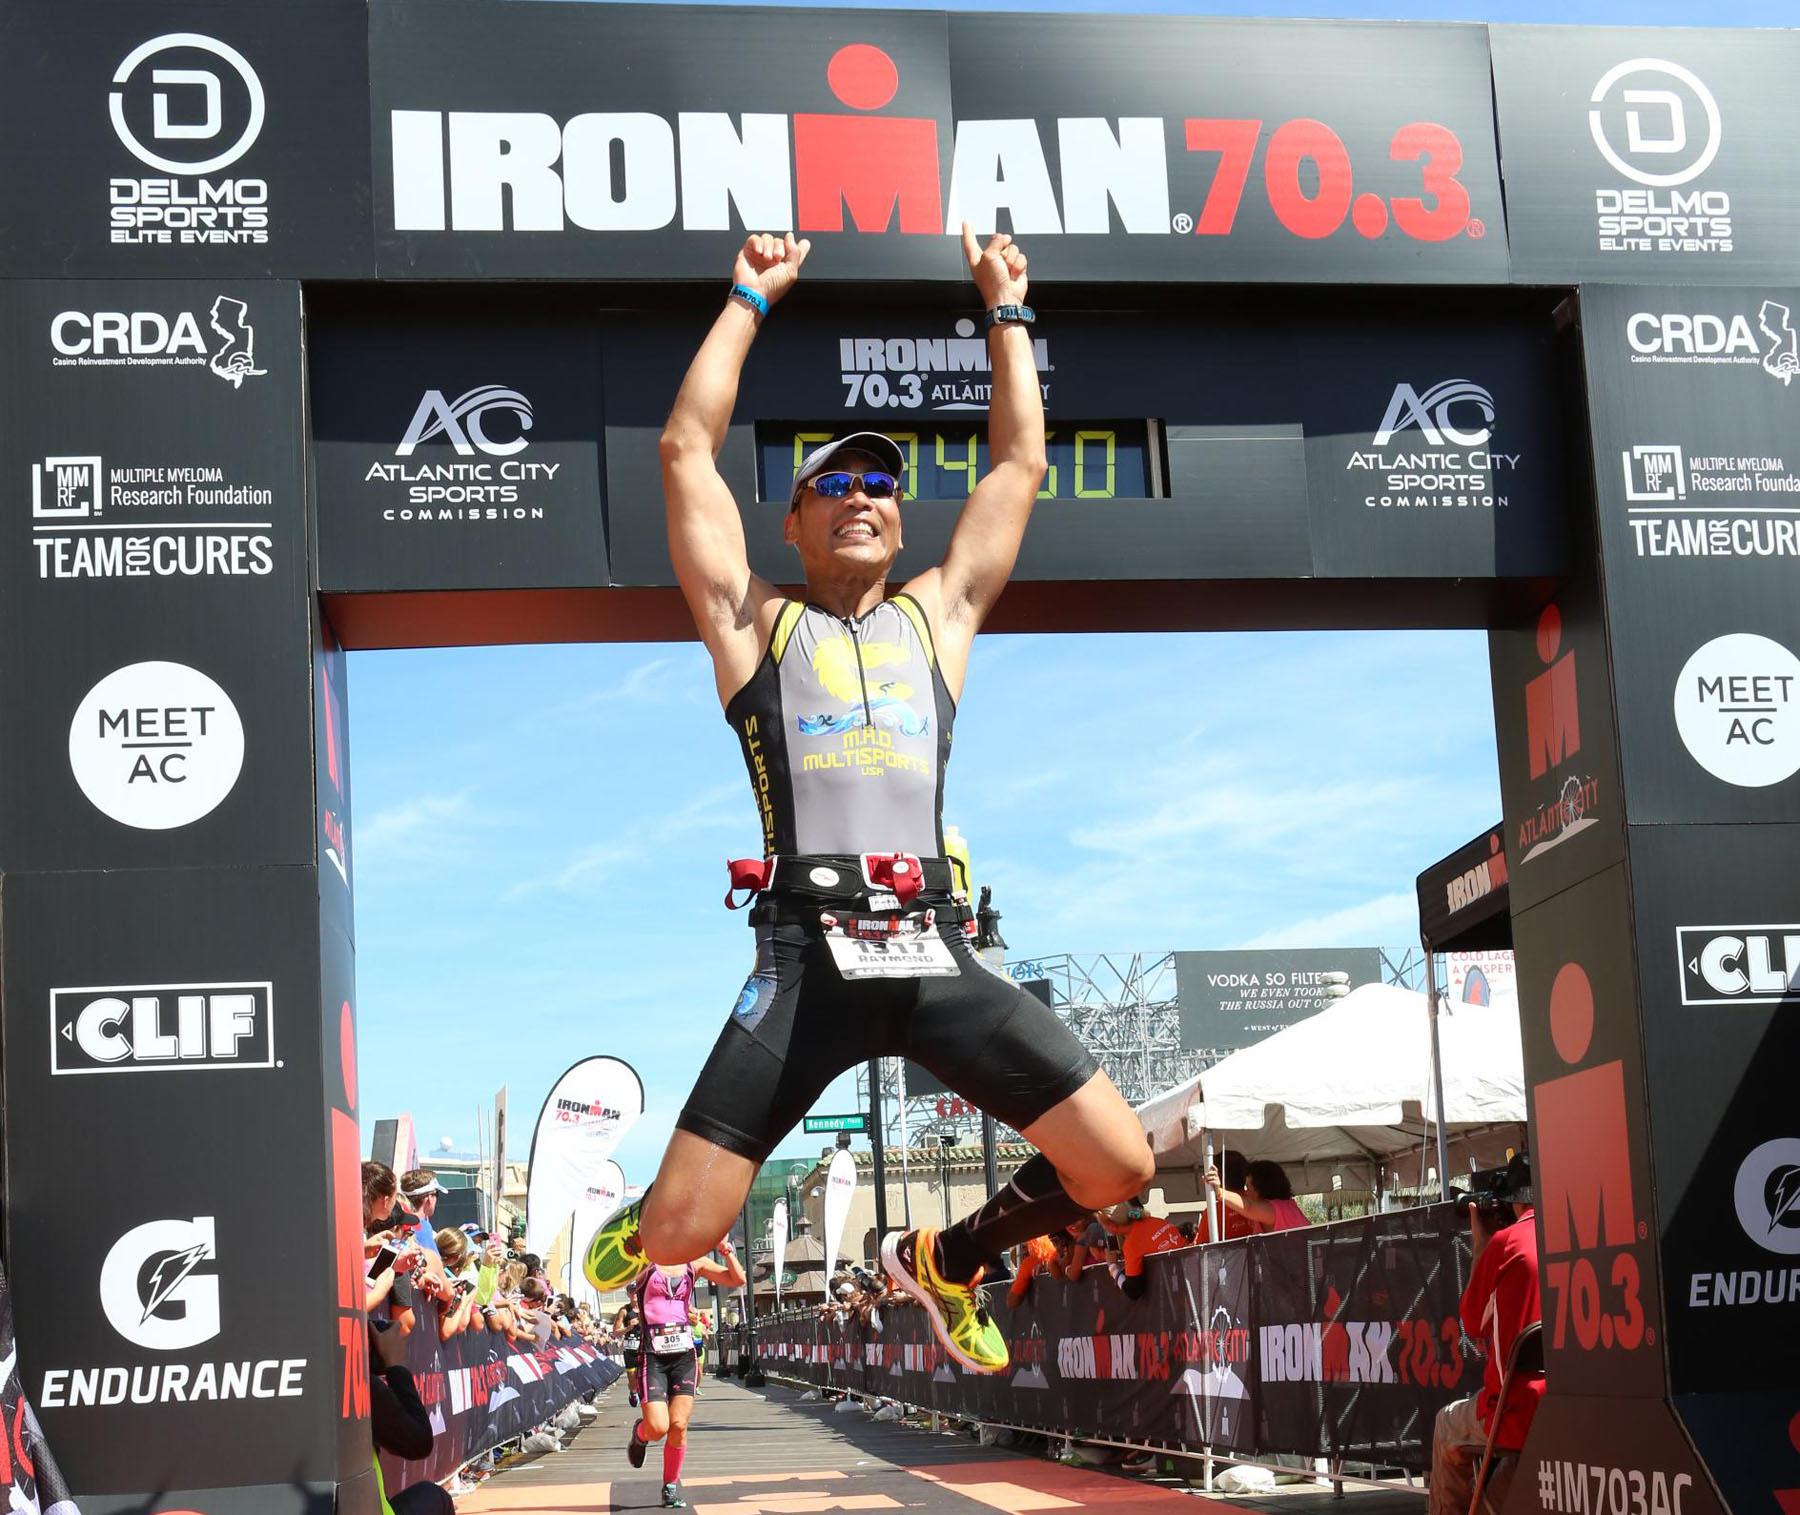 finish airtime- Ironman 70.3 Atlantic City